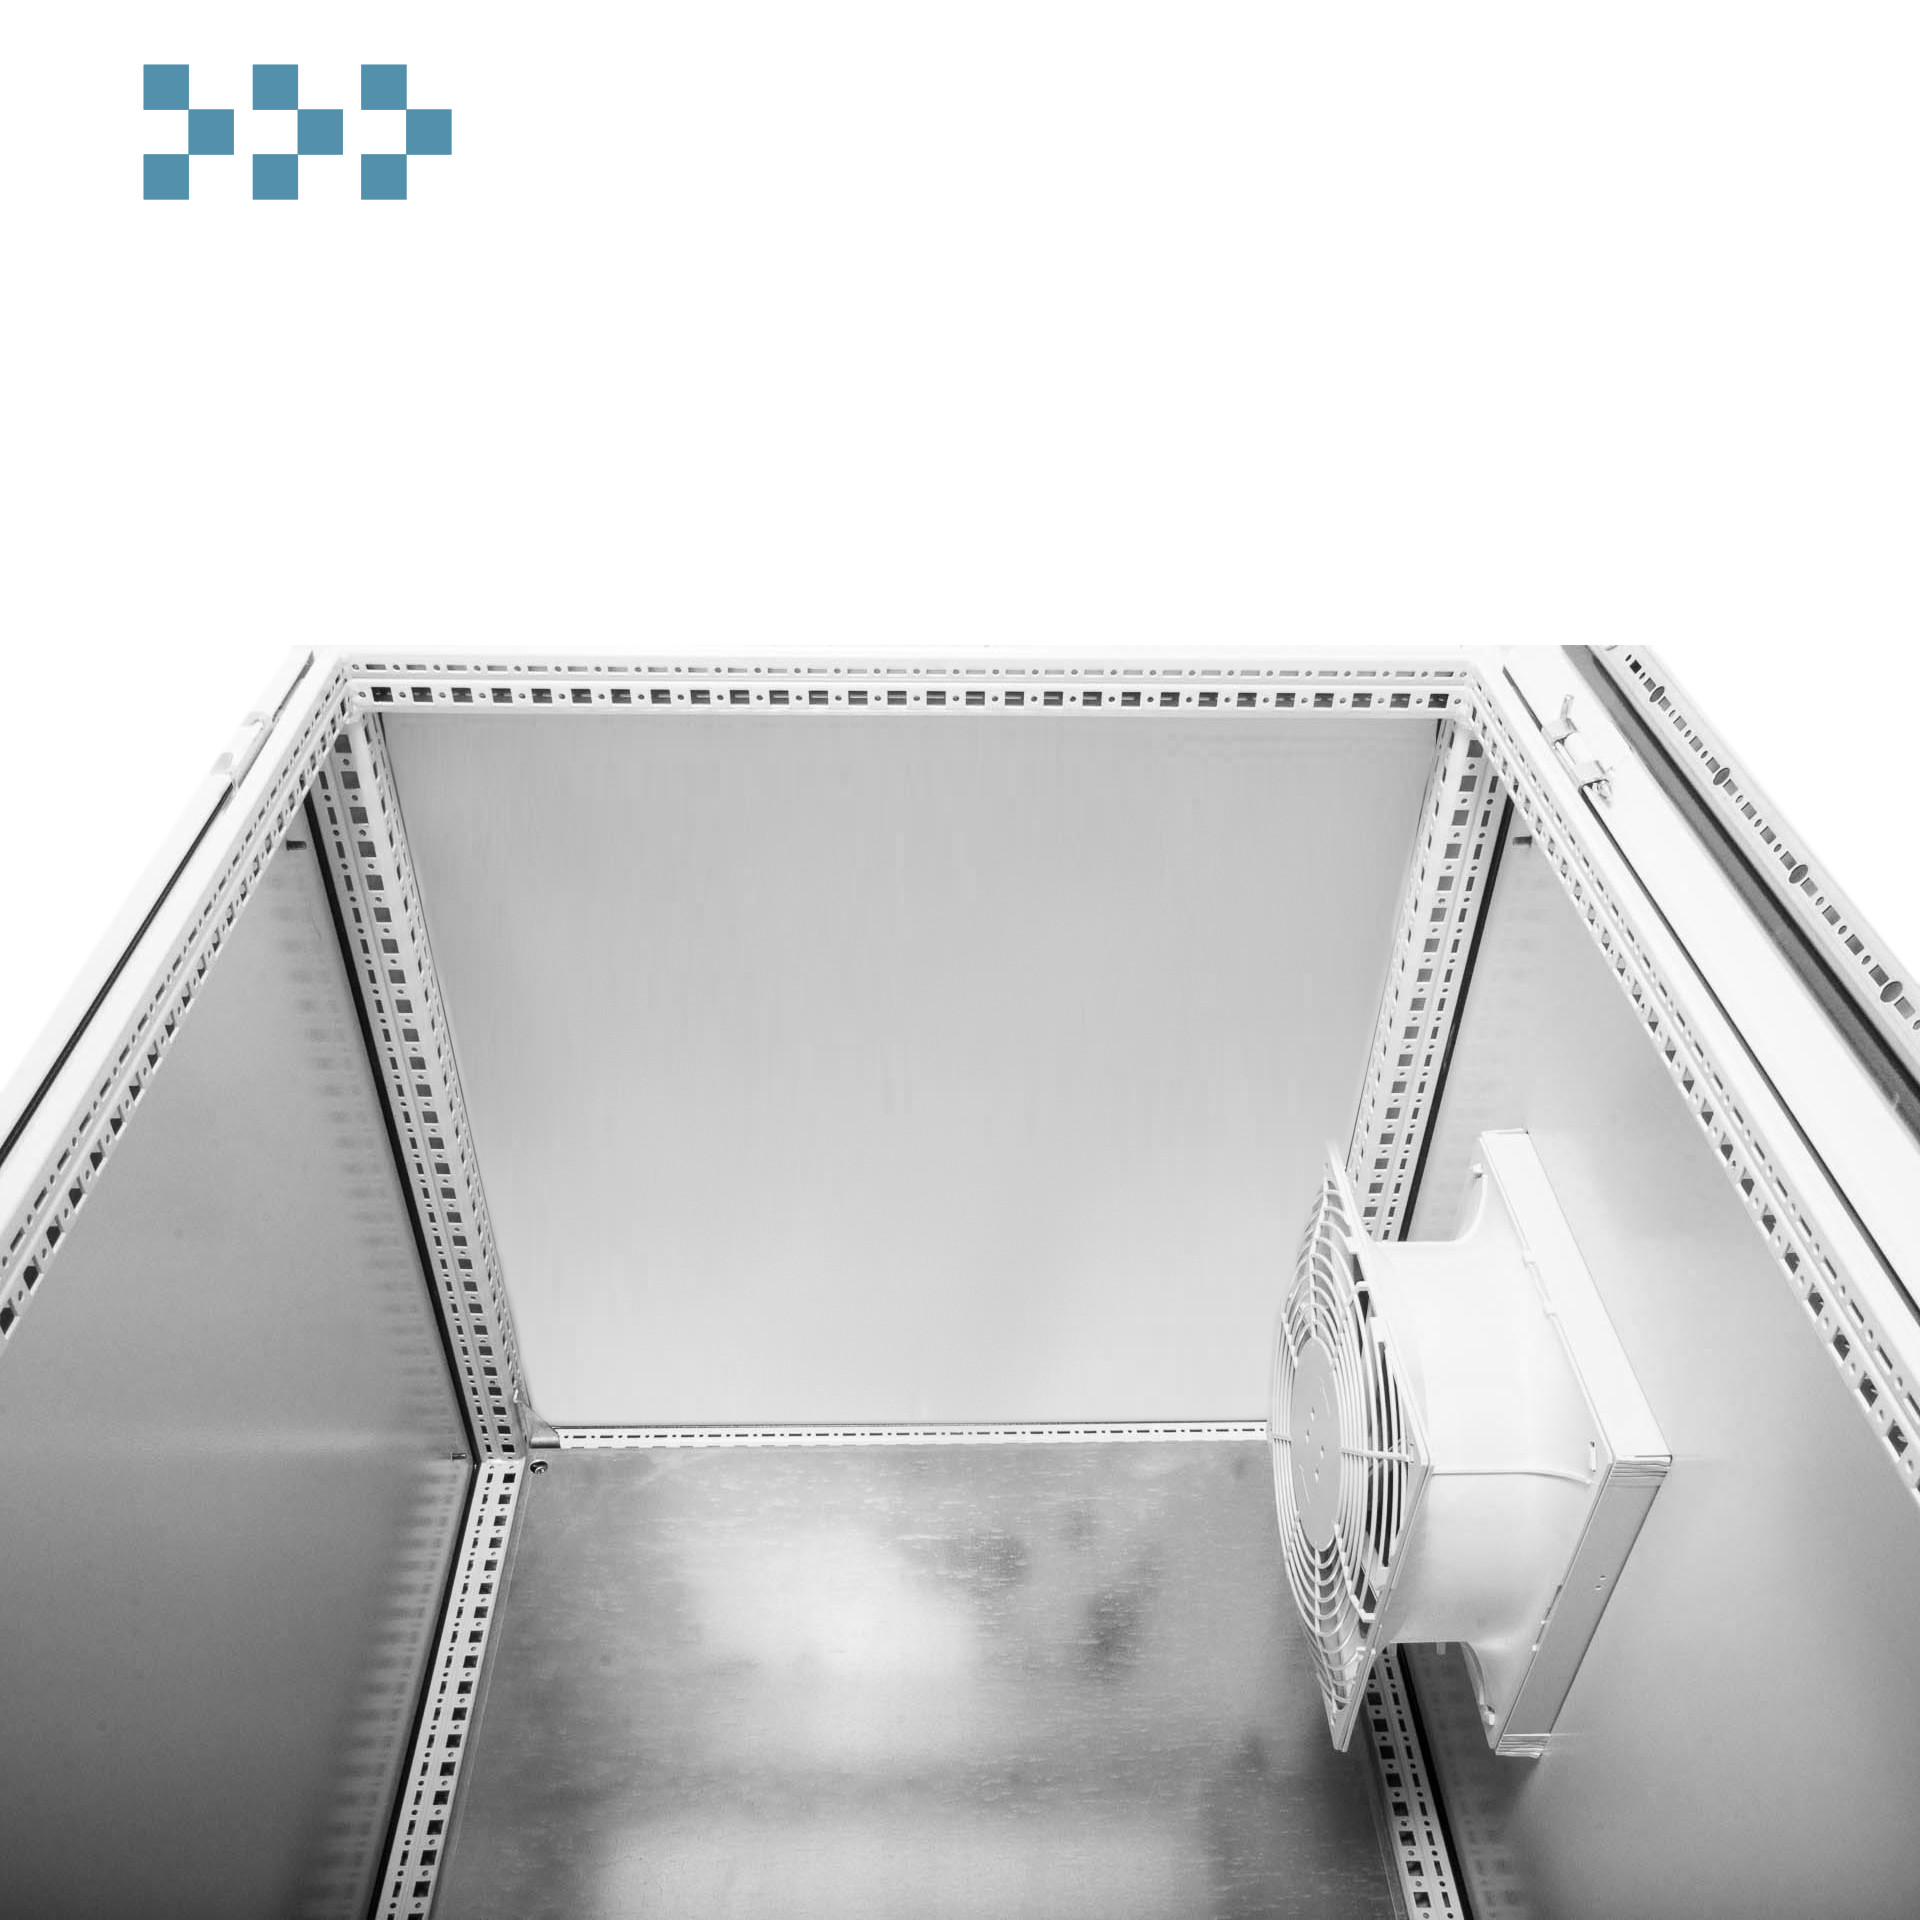 Комплект боковых стенок для монтажа вентилятора Pfannenberg PF Elbox EMS-WF-1800.x.800